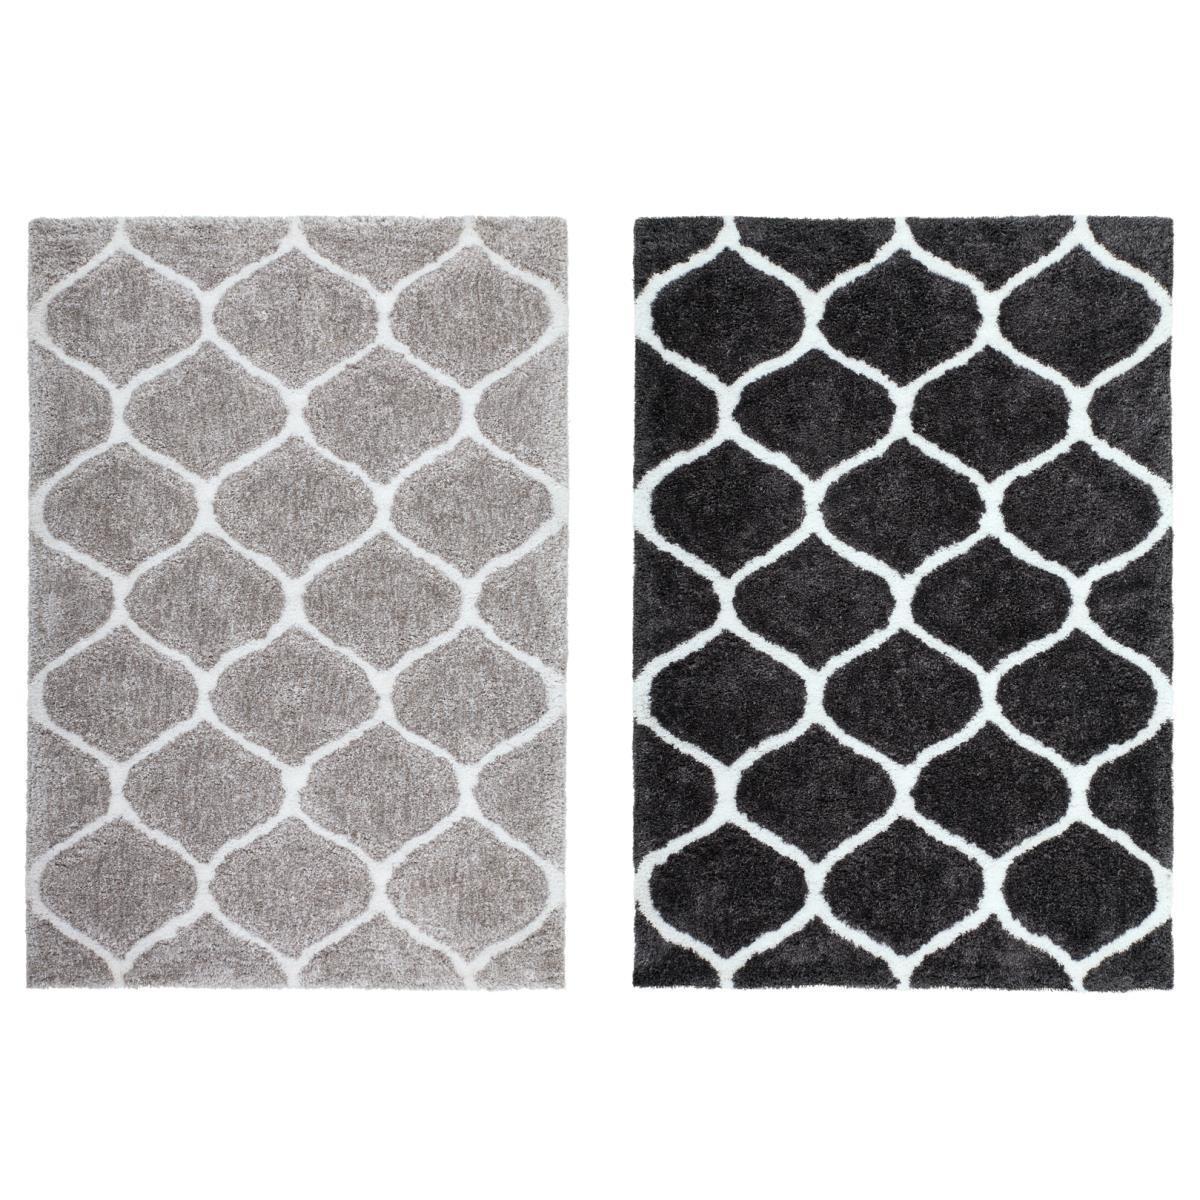 Tapis Long Poil Blanc poils longs longs longs shaggy tapis maroc motif poils longs